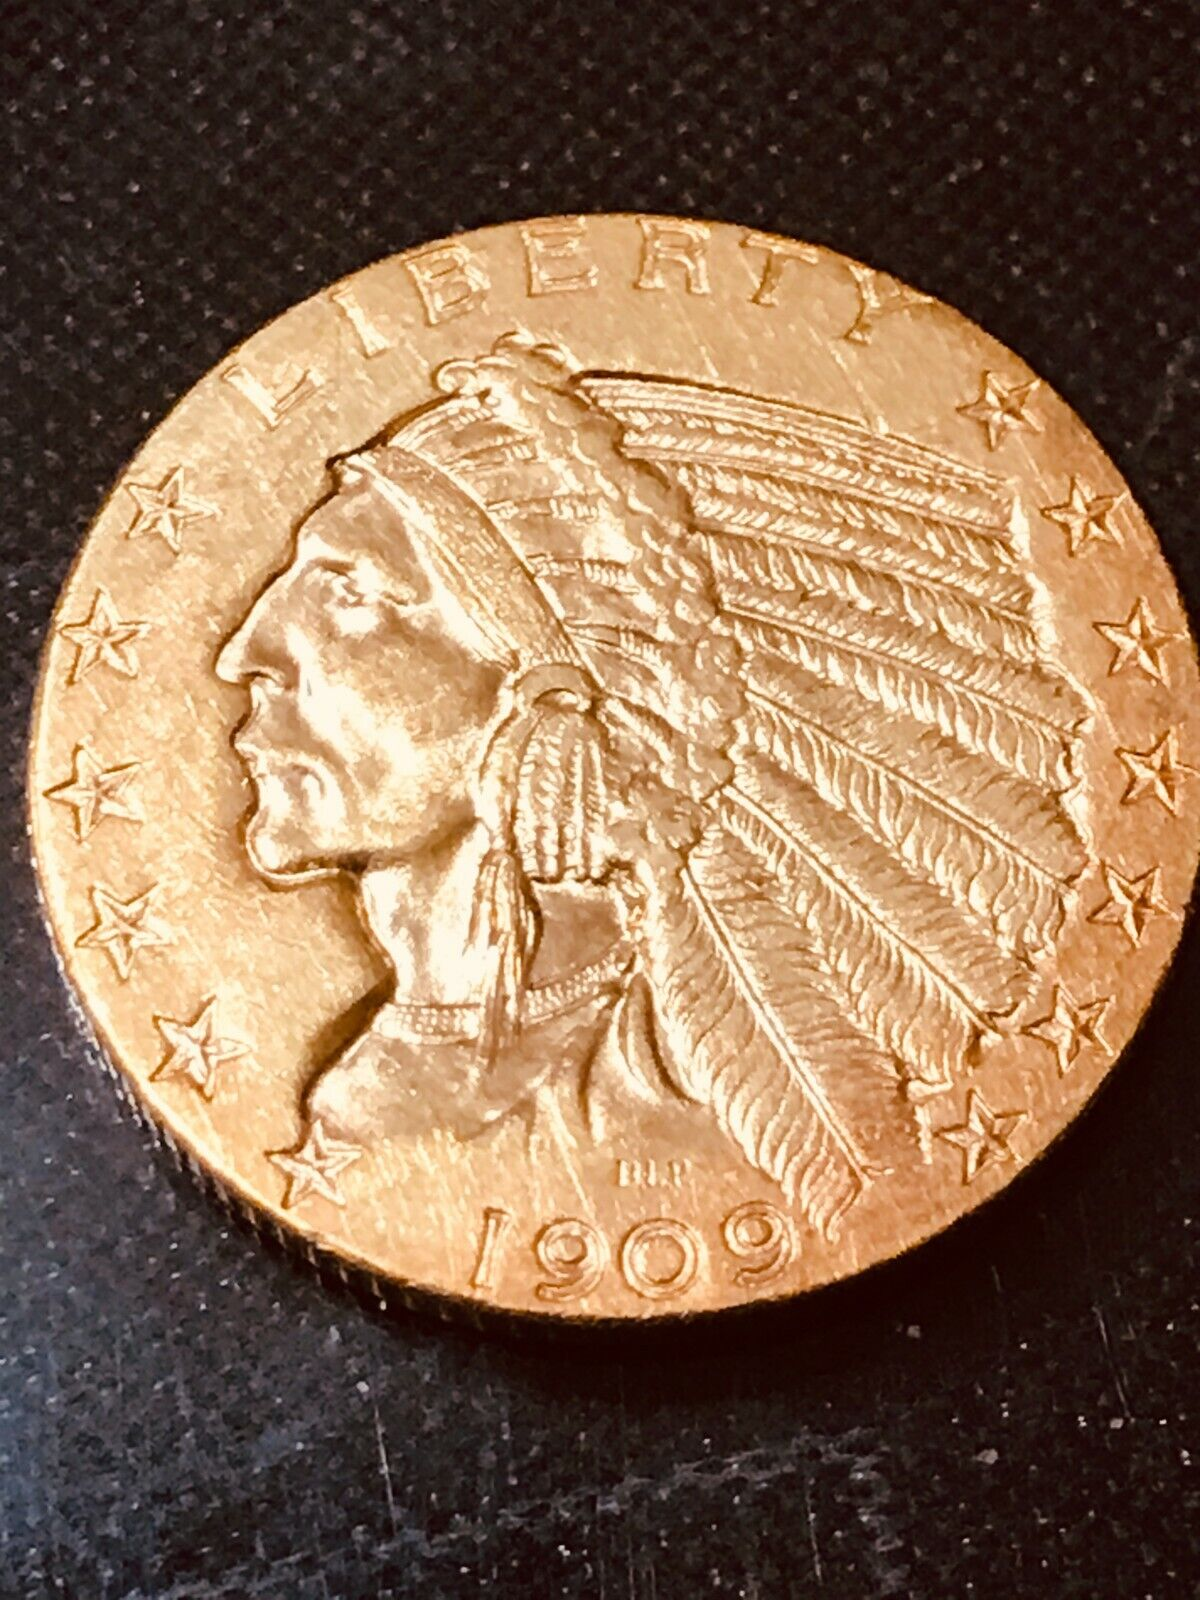 1909 D 5 INDIAN HEAD LIBDERTY GOLD HALF EAGLE DOLLAR DENVER - $521.00